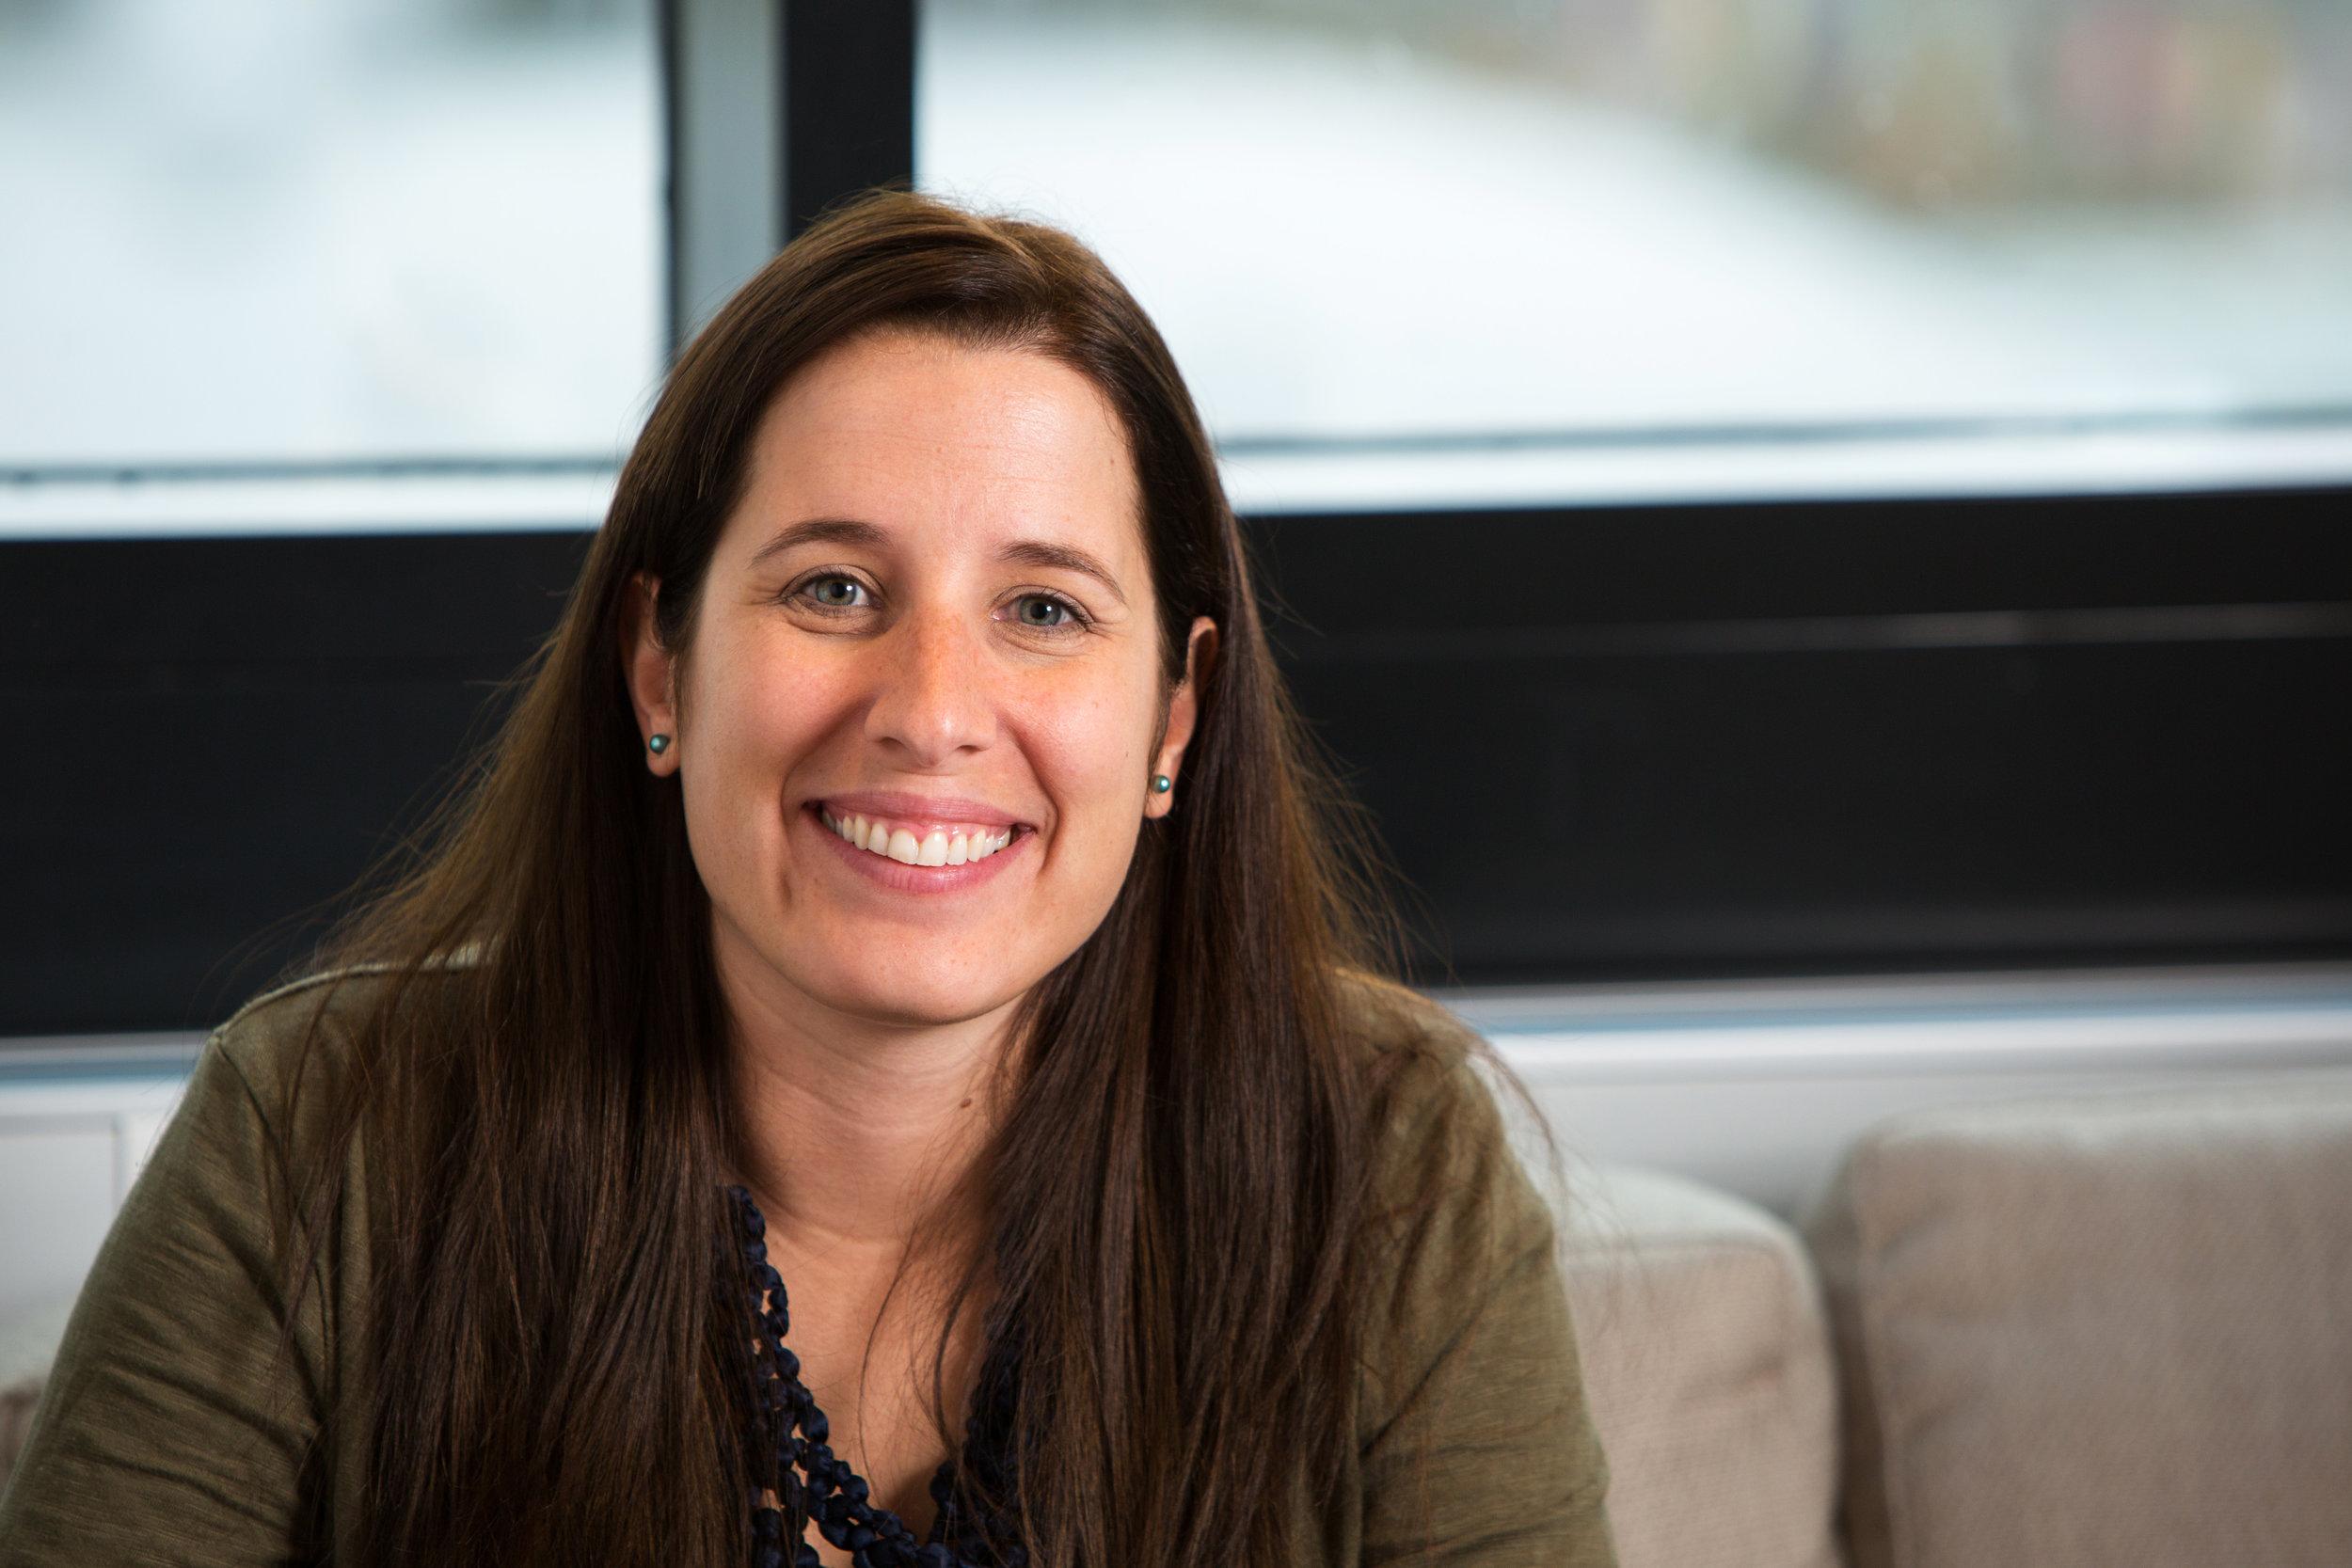 Eleni Vlami, Head of Account Management at Meniga and Mentor